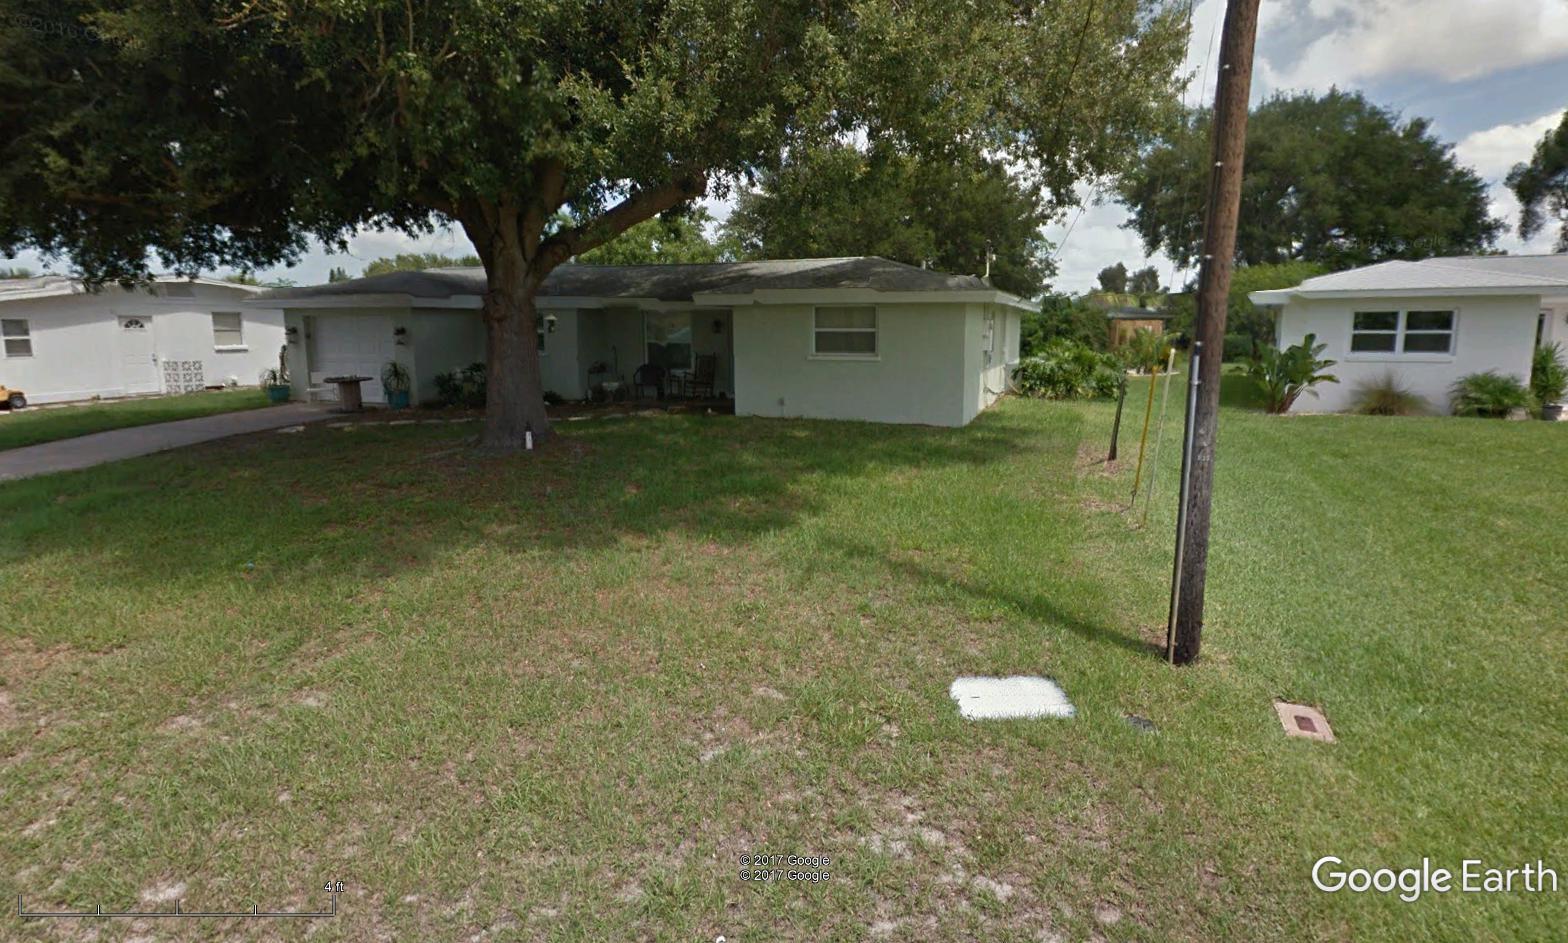 511 Sandlewood Dr, Venice FL